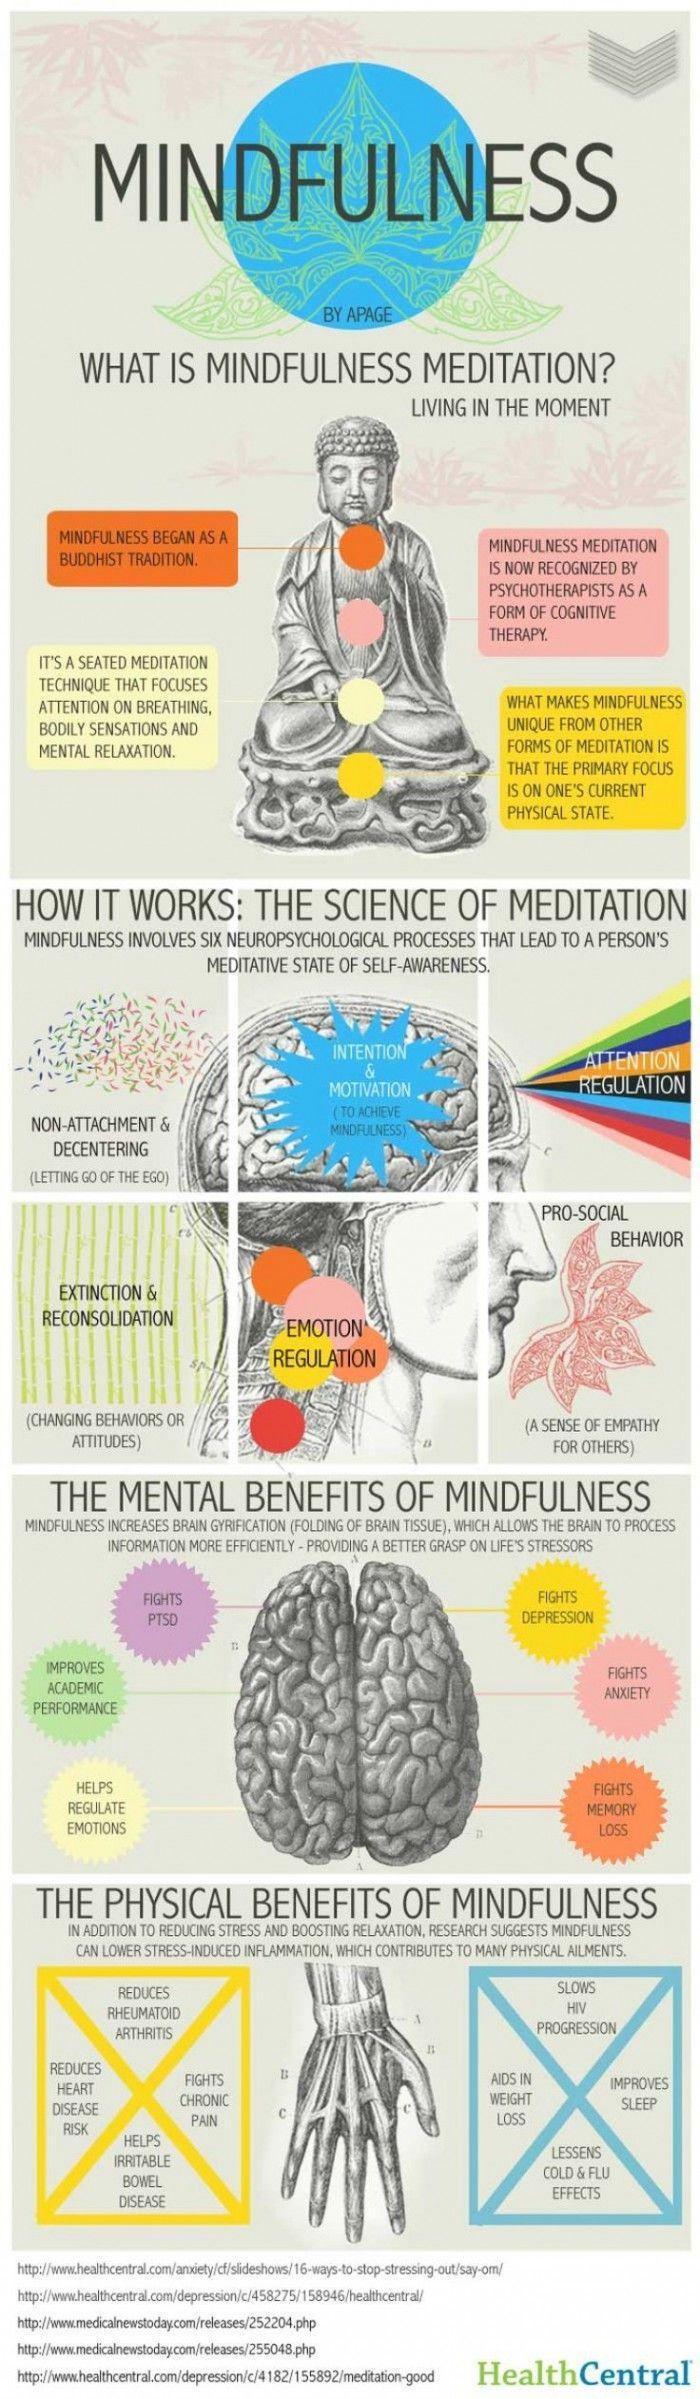 Benefits of Mindfulness (Meditation) | Lynn Hasselberger for Elephant Journal | #infographic #meditation #mindfulness